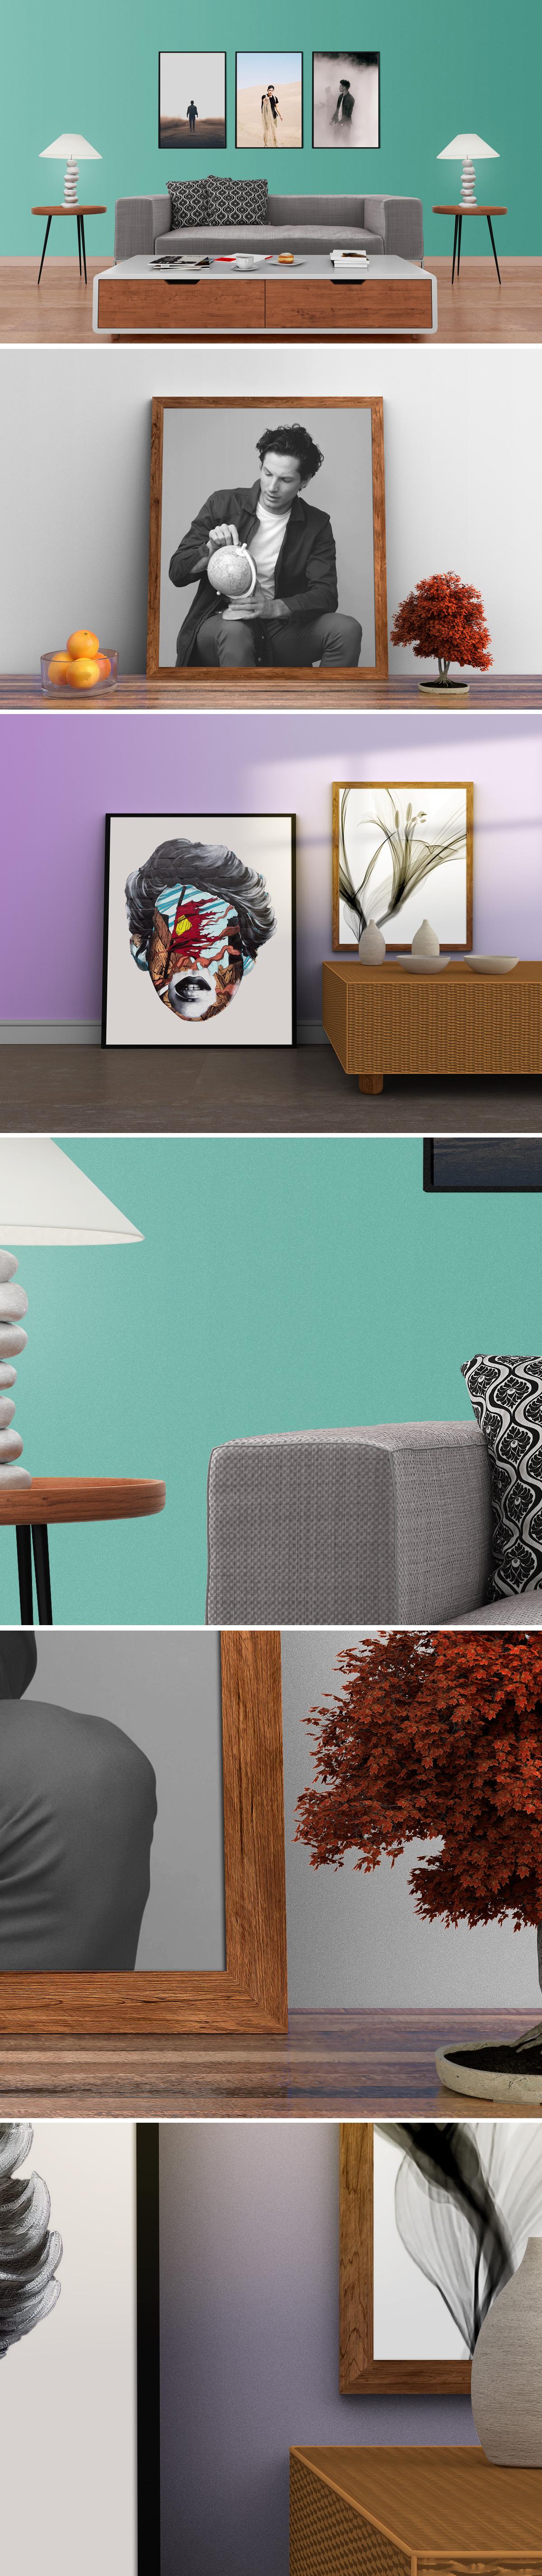 Home Interior Photo Frame Mockup PSDs